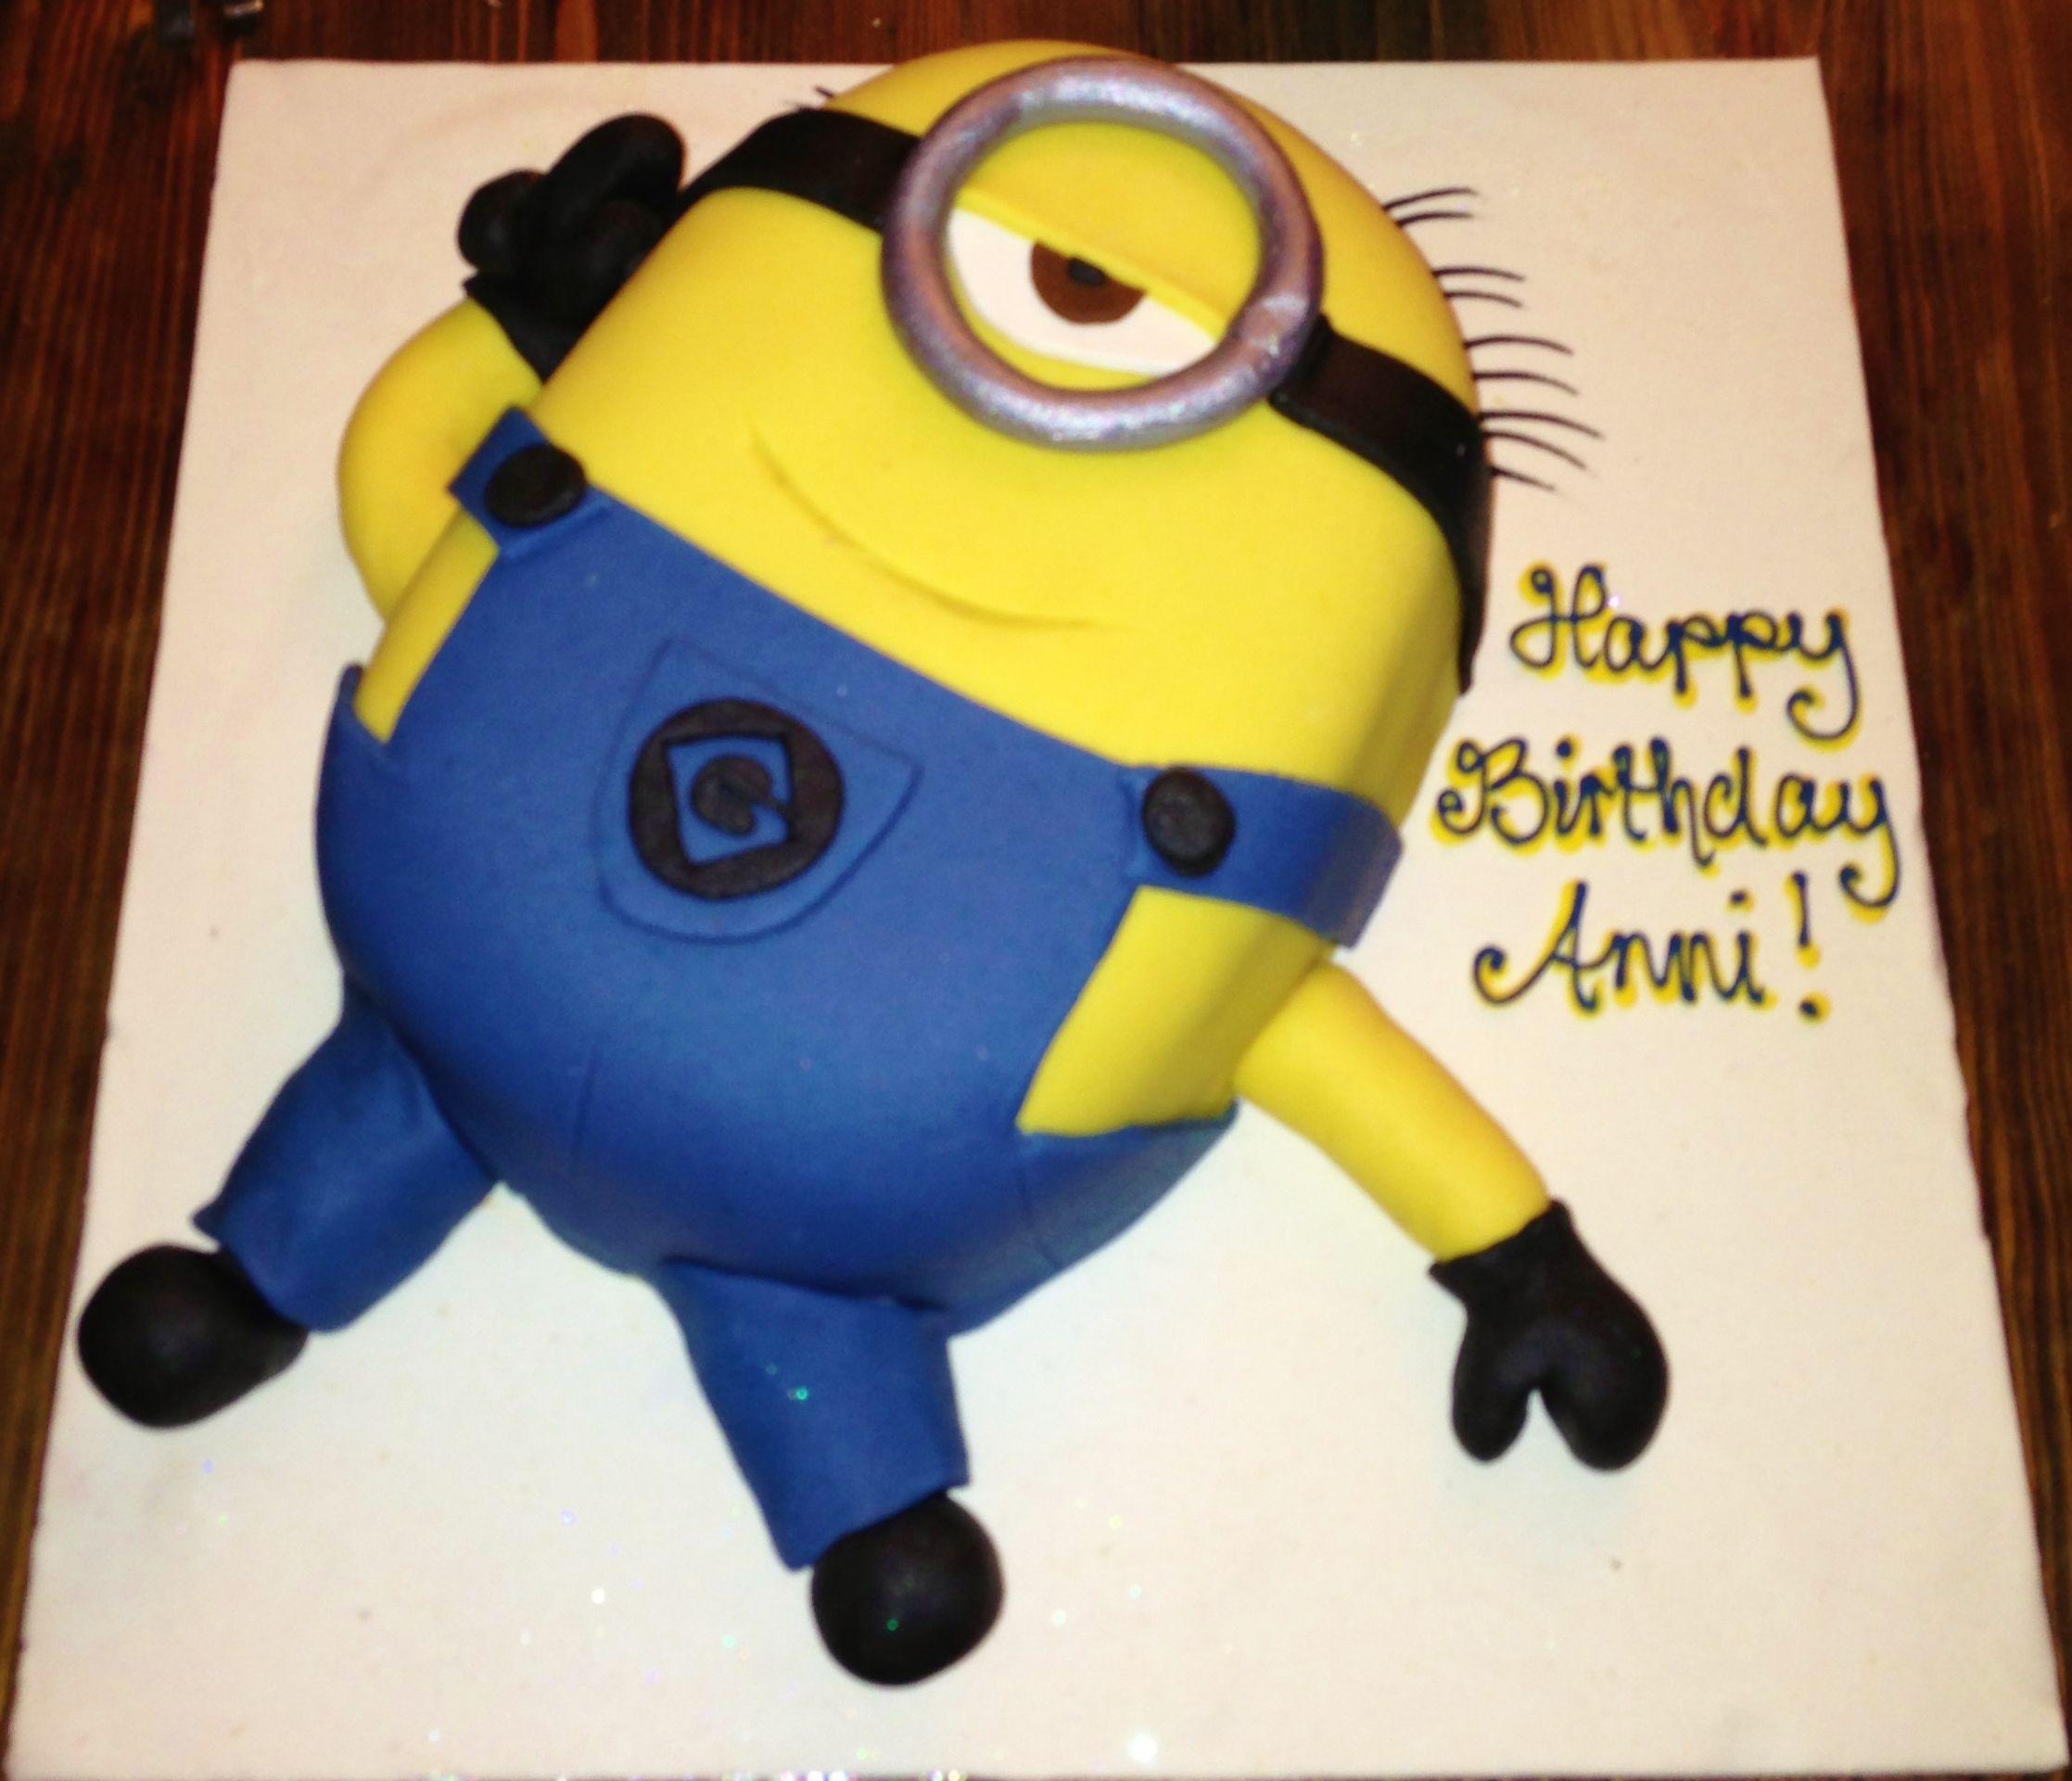 Minion 3d cake bespoke cake design pinterest 3d cakes cake minion 3d cake maxwellsz